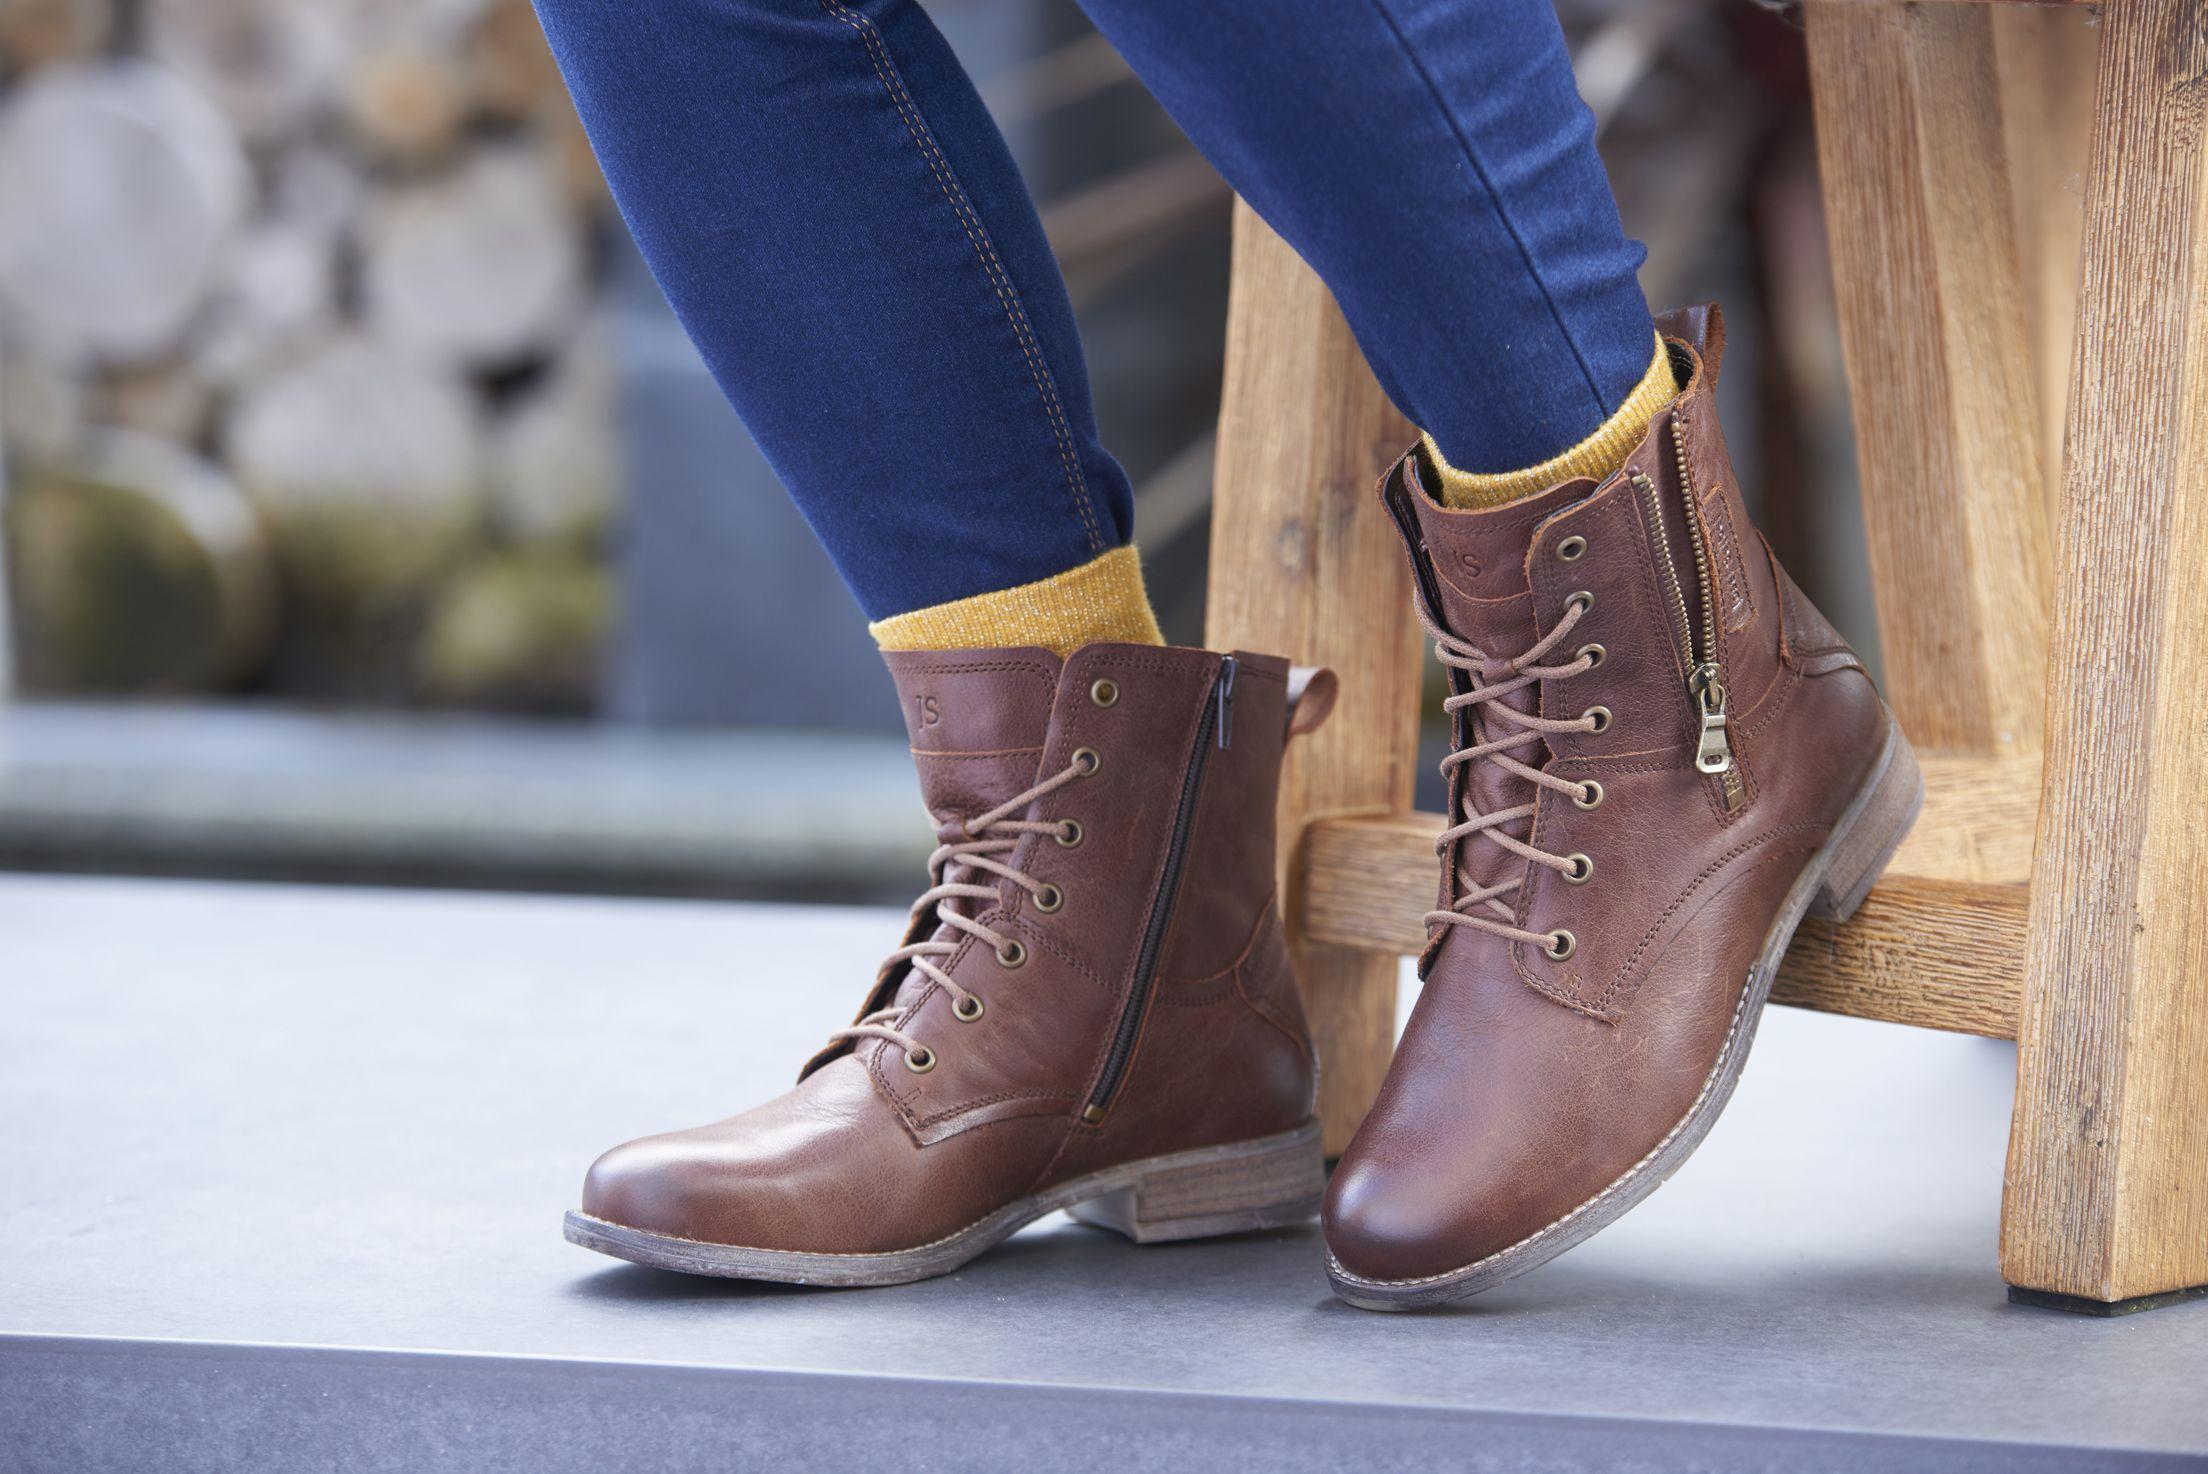 josef seibel combat boots purchase